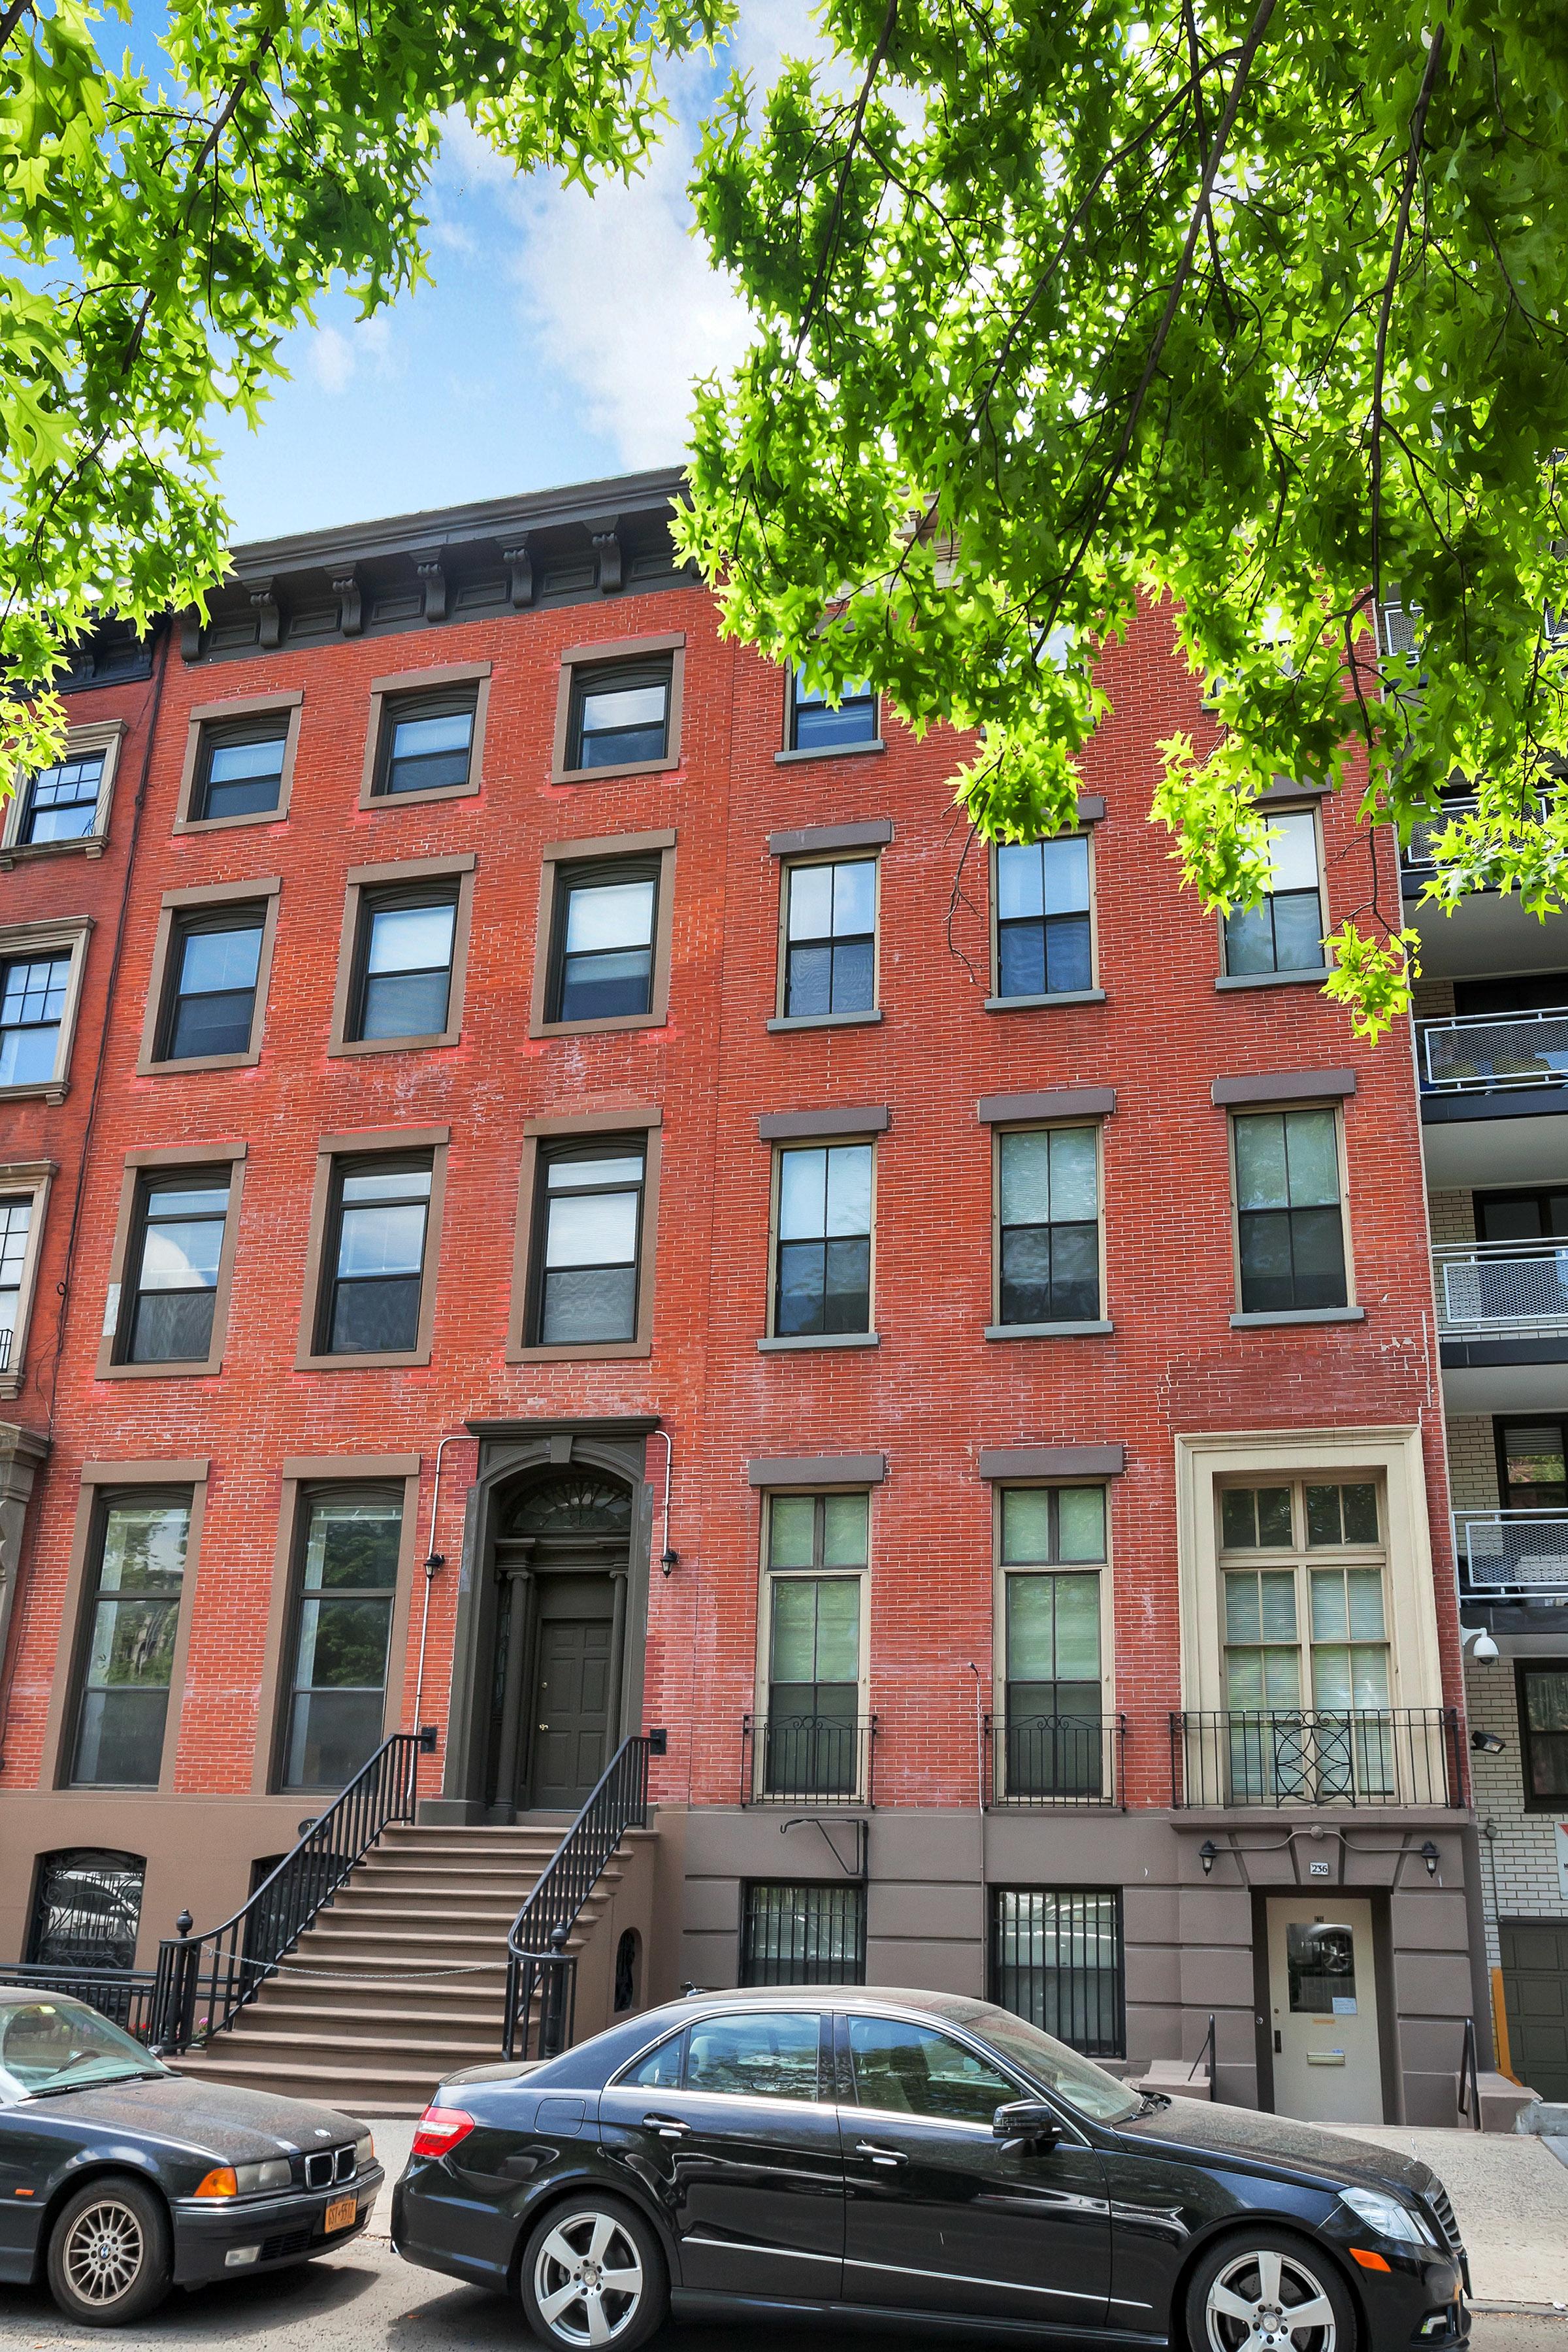 236-238 East 15th Street - $19,750,000